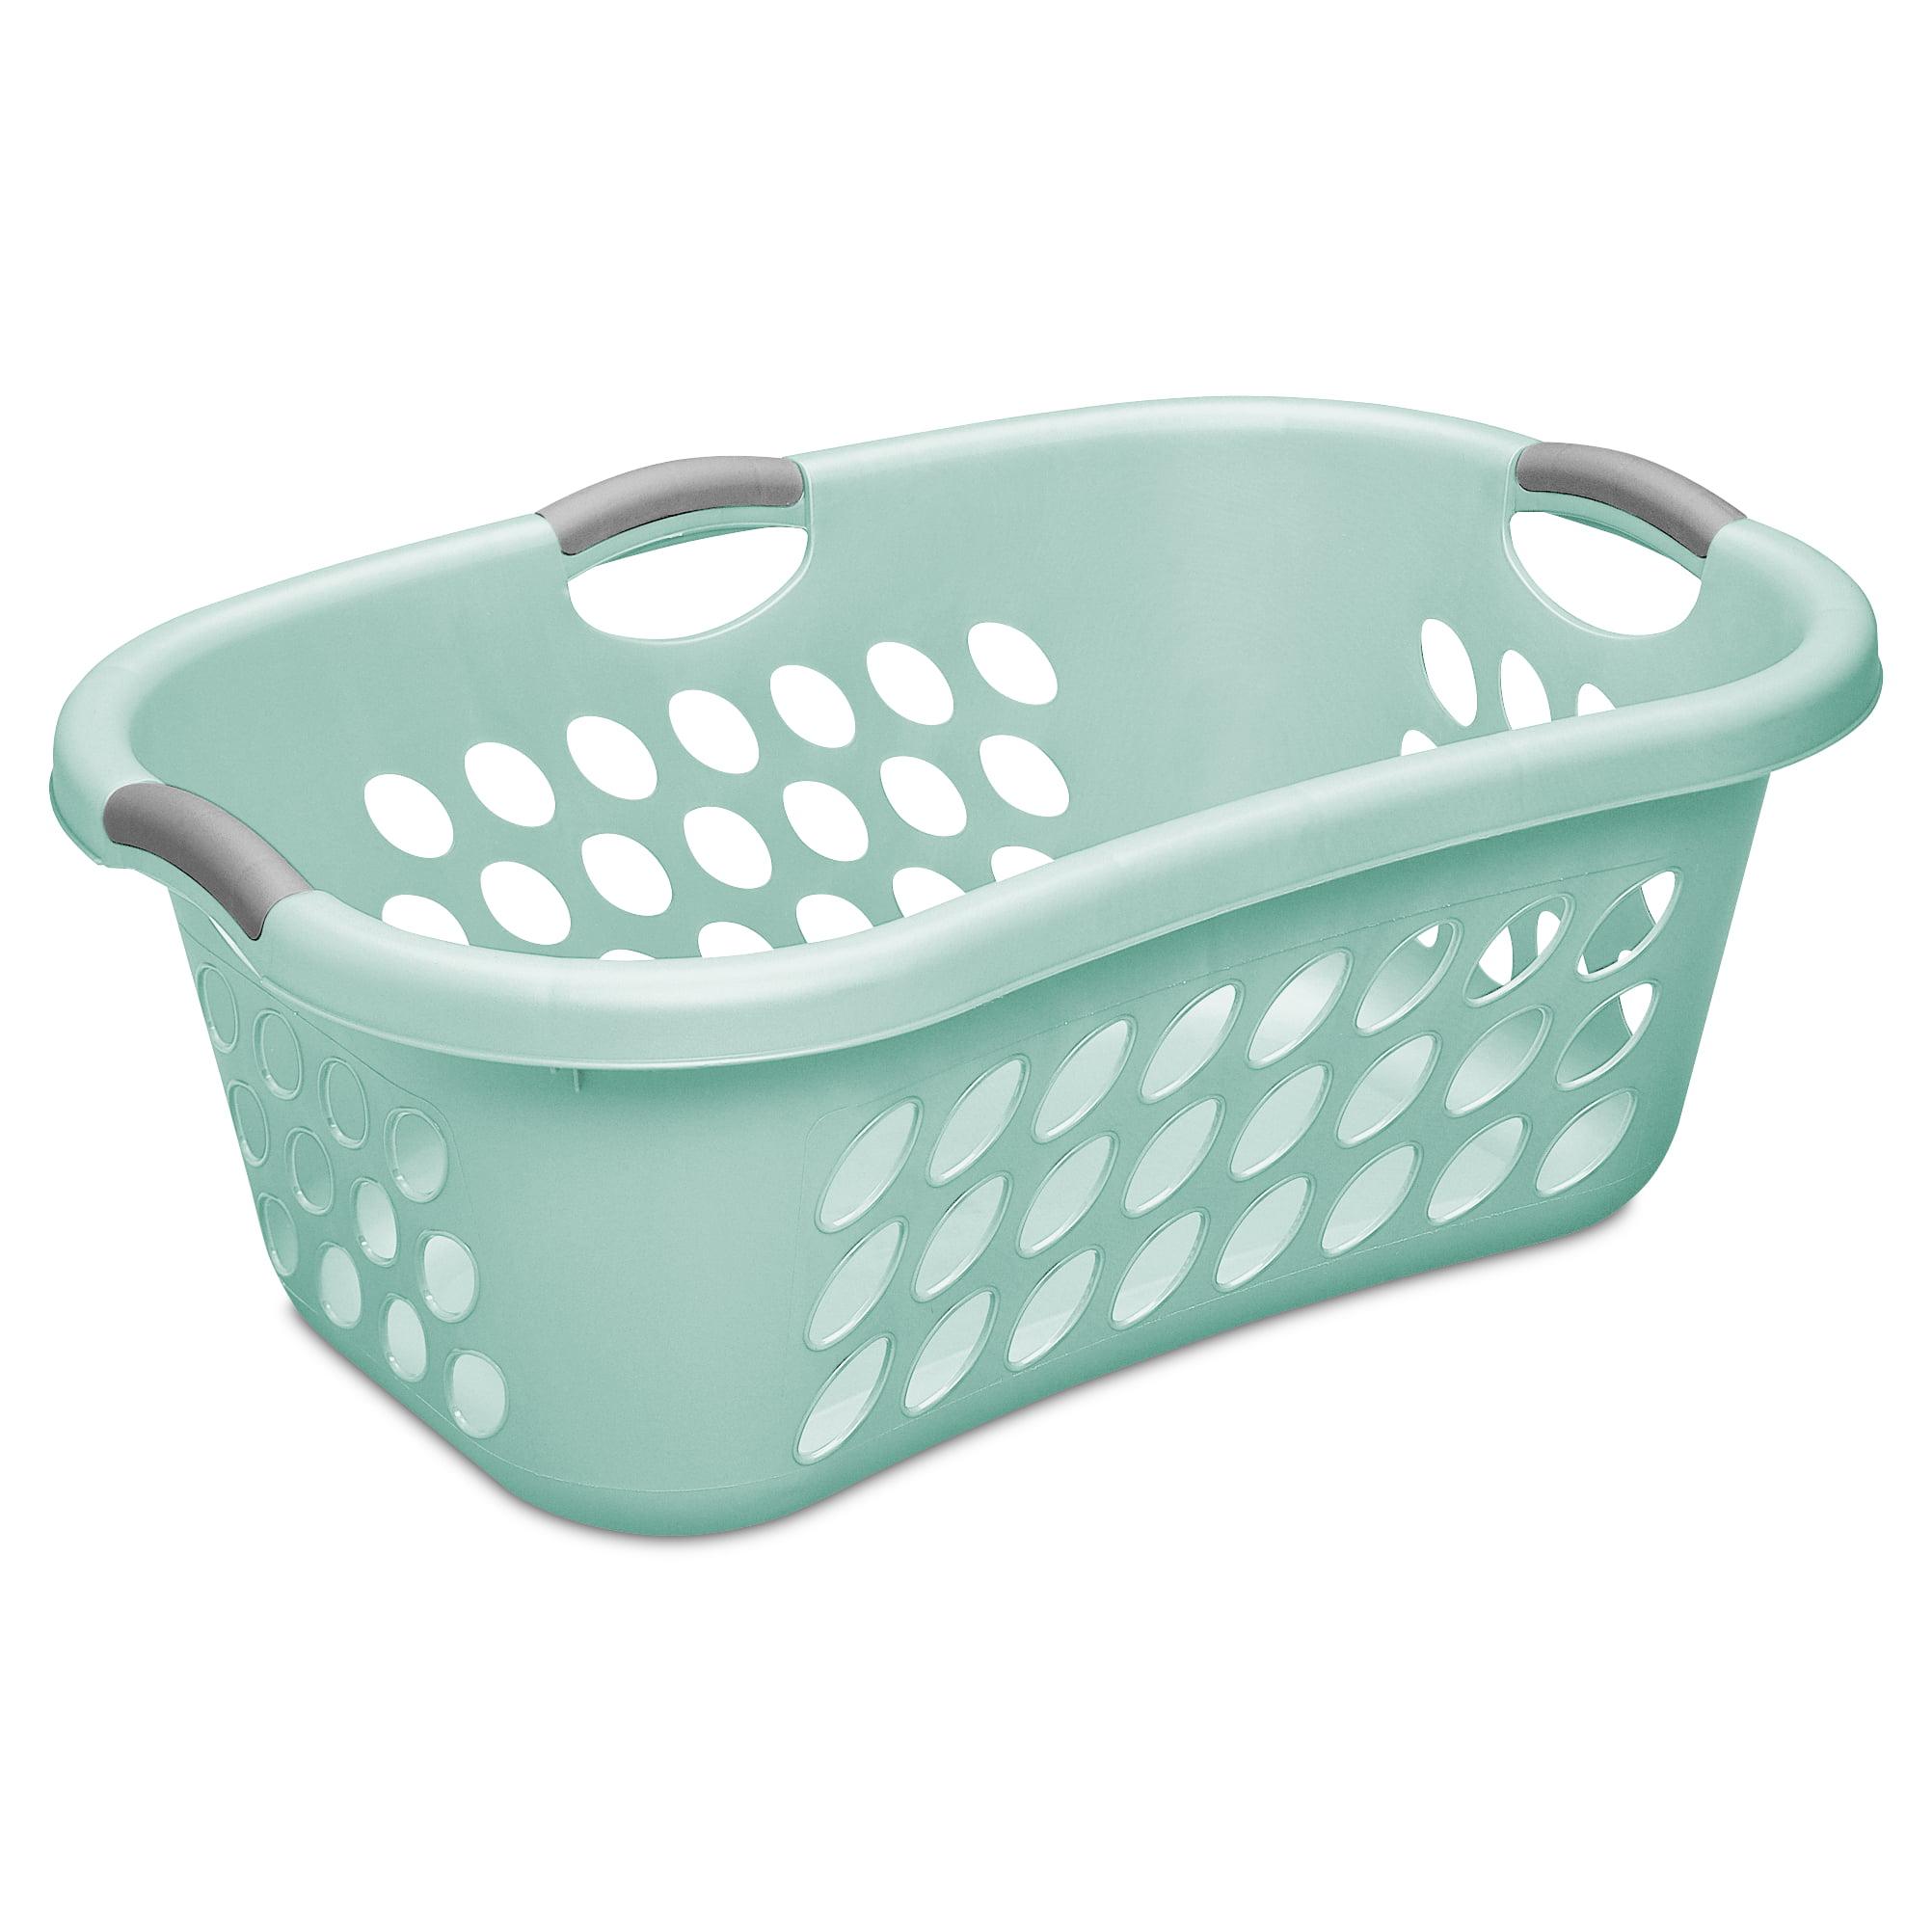 Sterilite 1.25 Bushel Hip Laundry Basket, Aqua Chrome (Available in ...